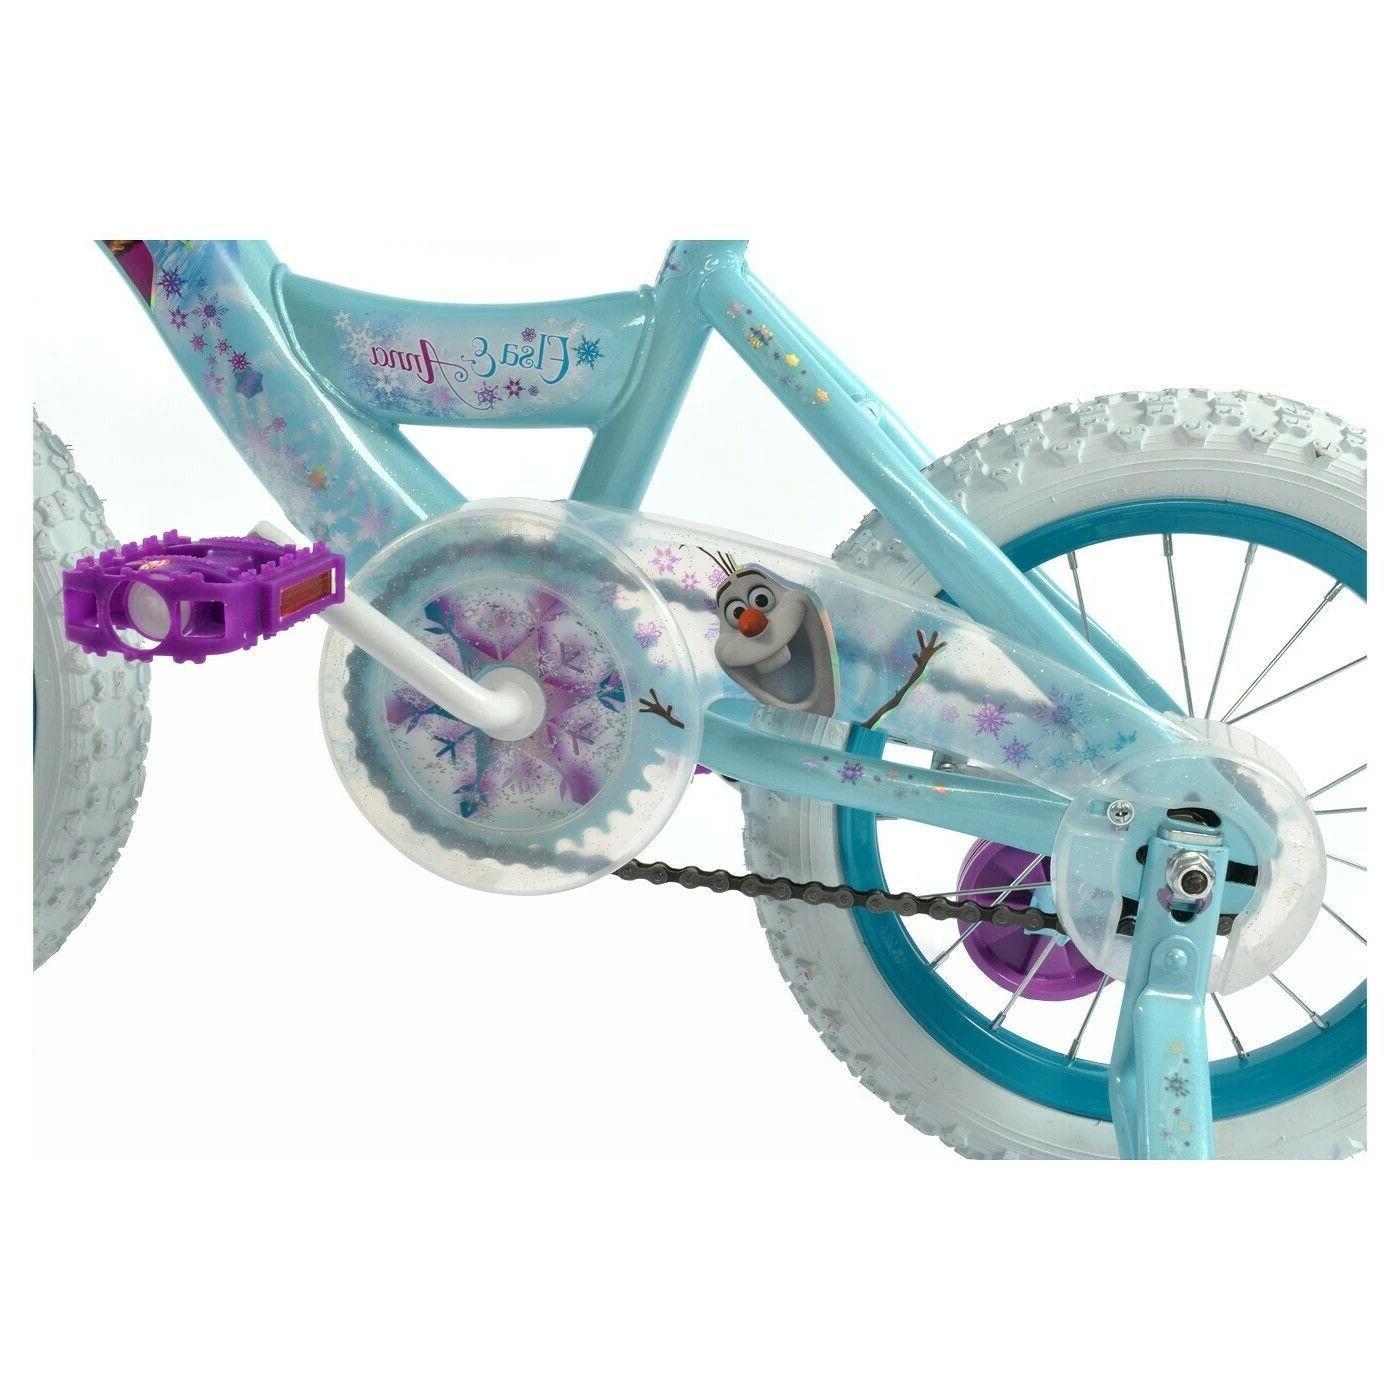 "Huffy Disney Frozen Bike Sleigh - 14"", 3 yrs"